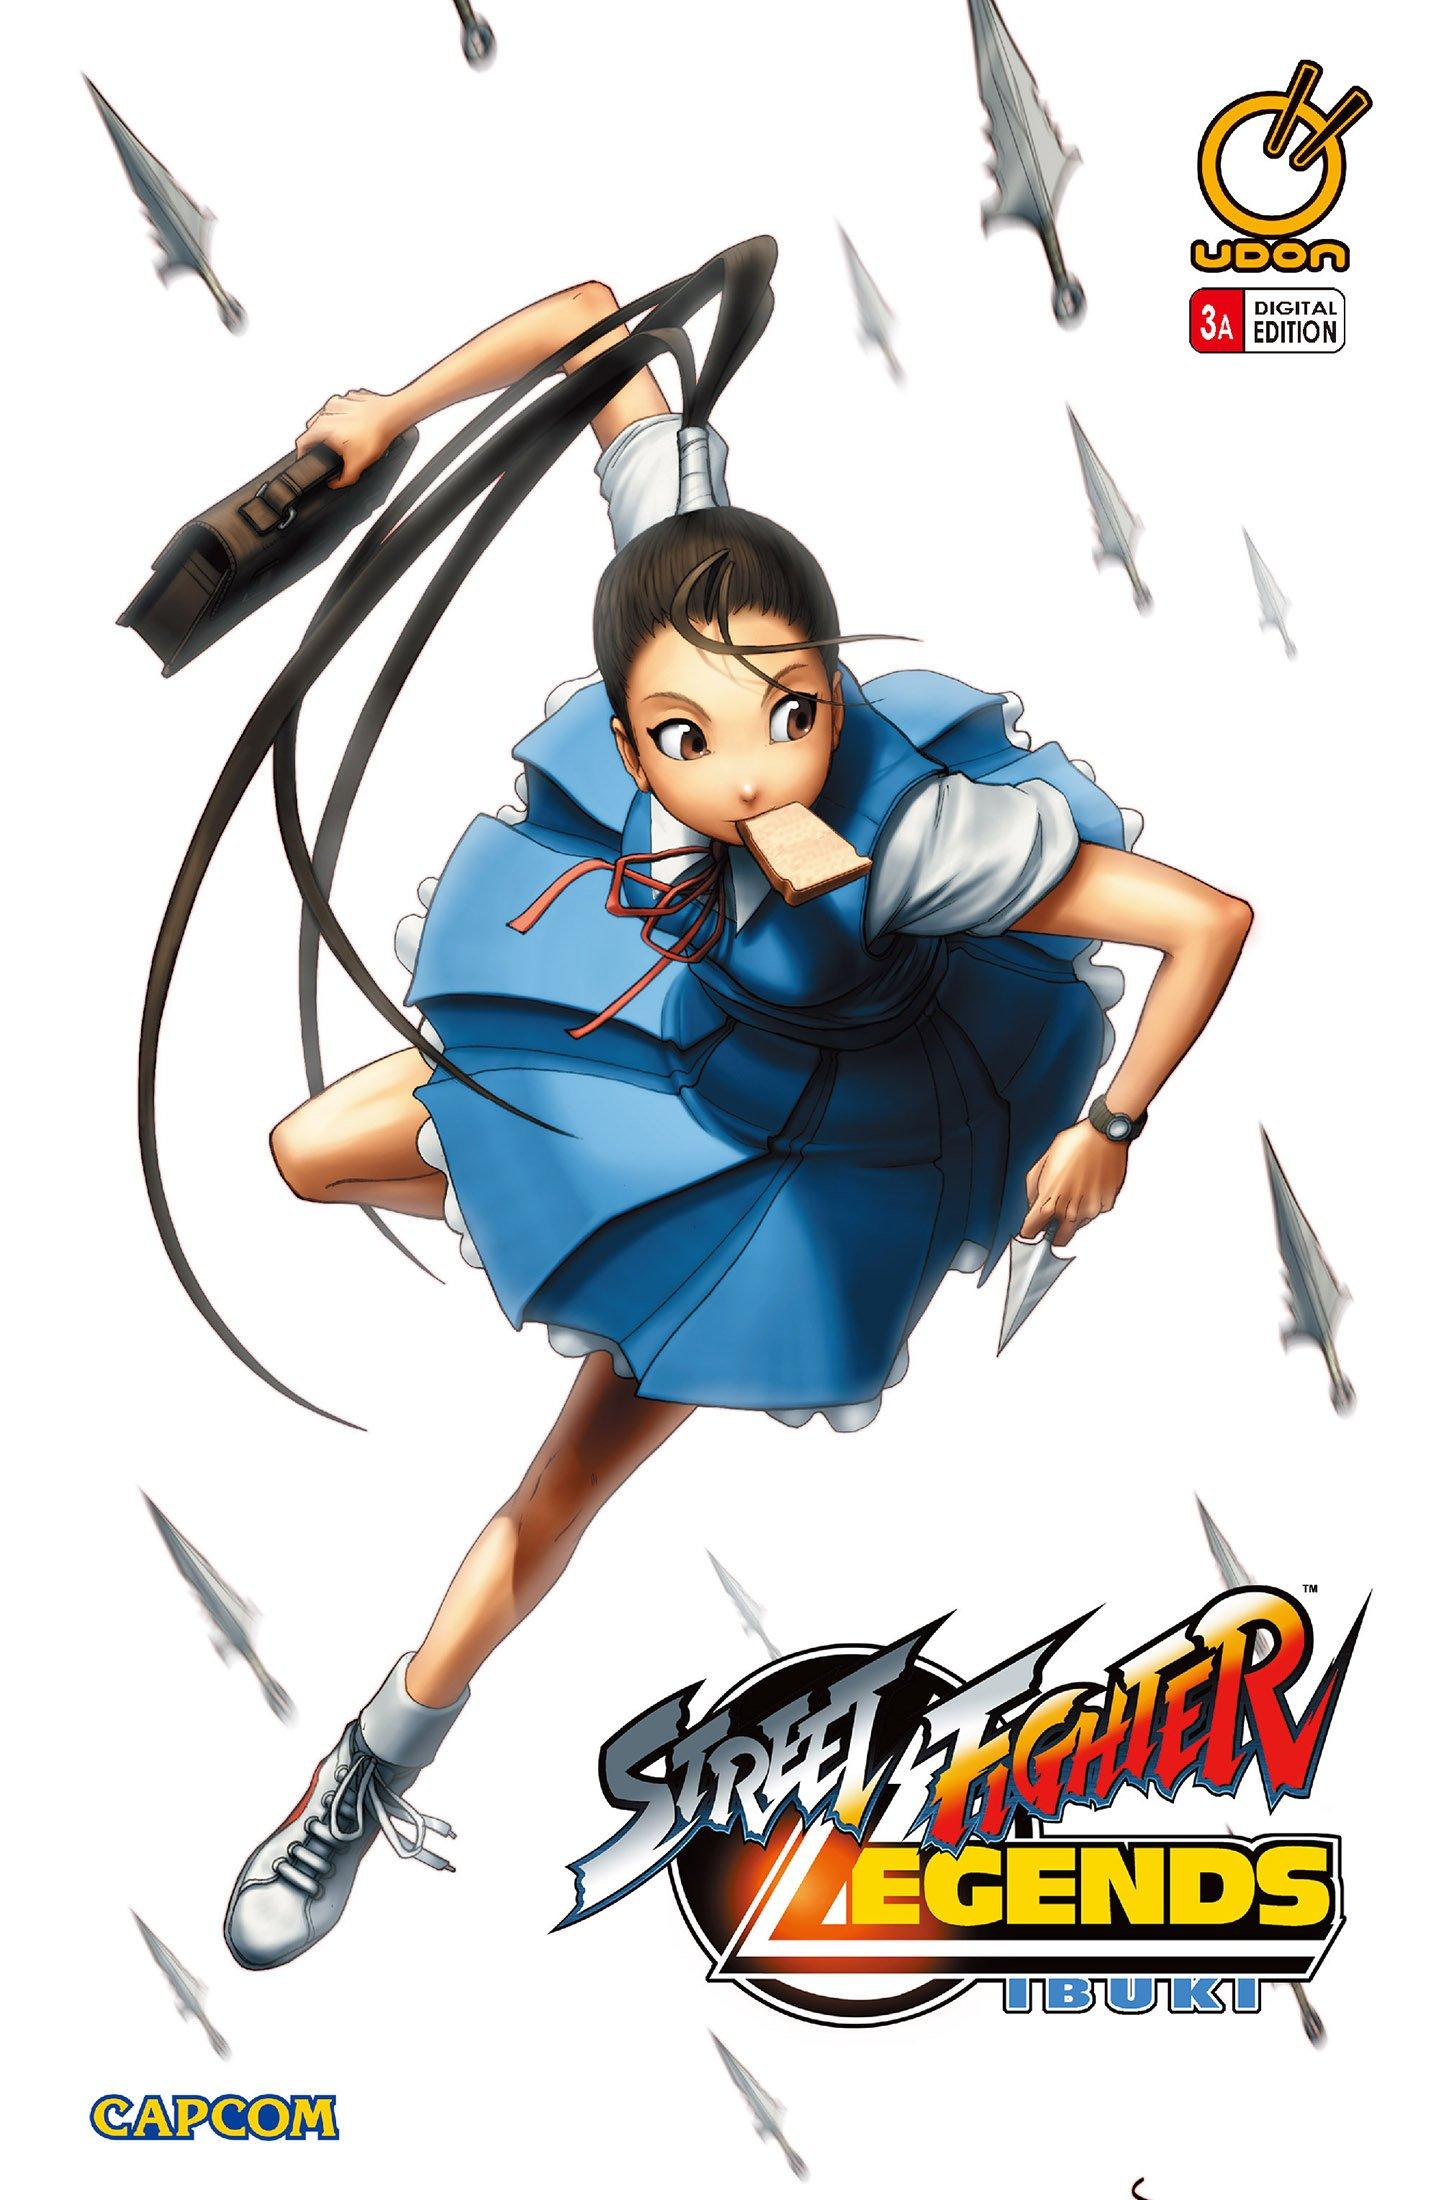 Street Fighter Legends: Ibuki 003 (June 2010) (cover a)